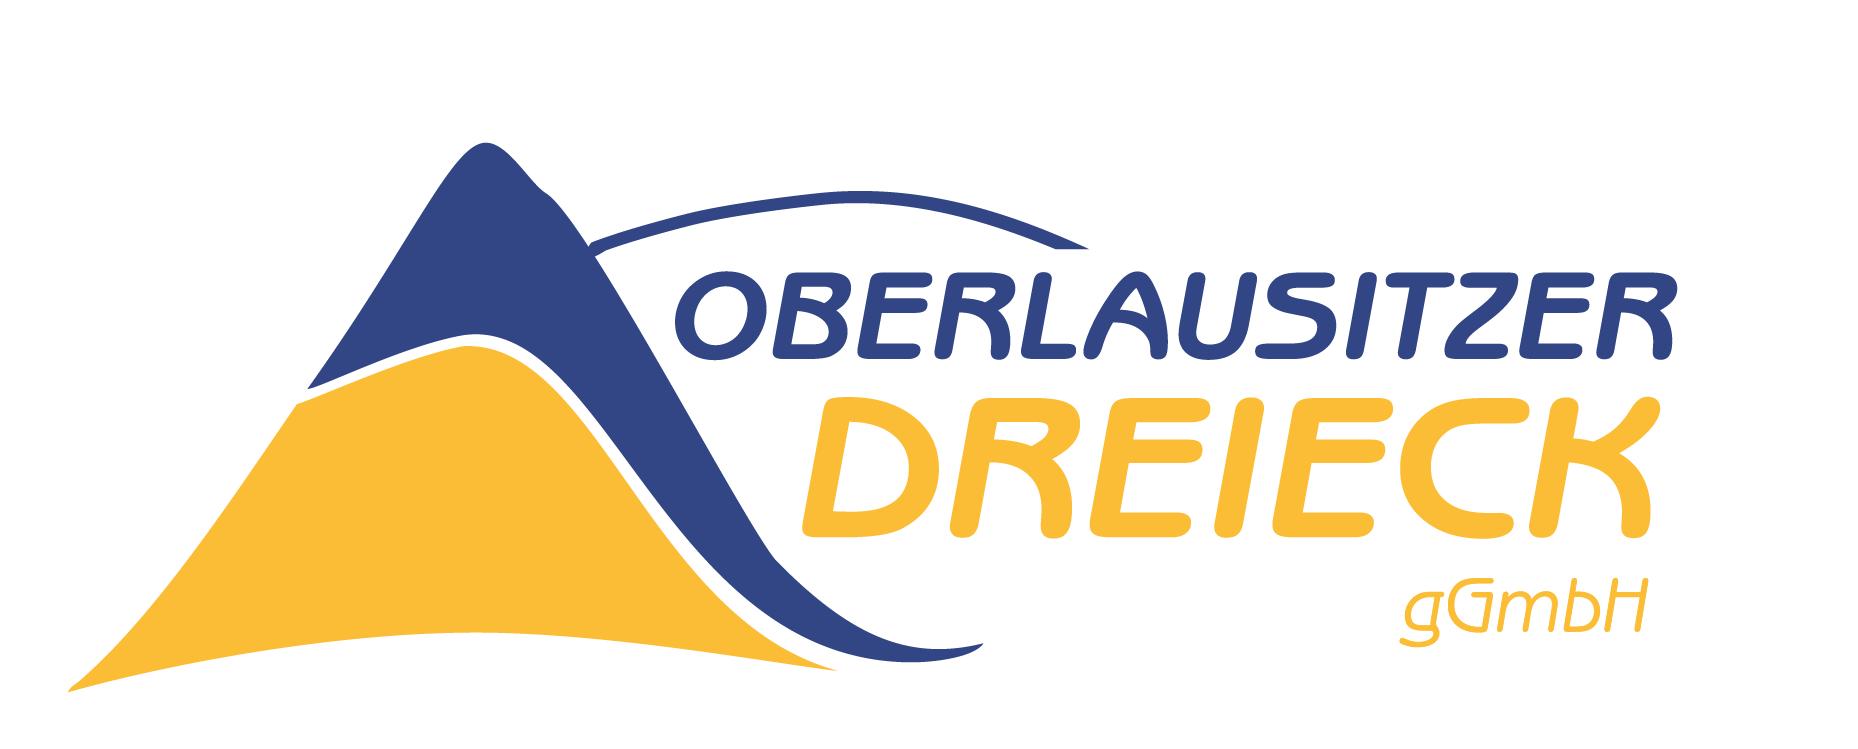 Oberlausitzer Dreieck gGmbH - Gästehaus